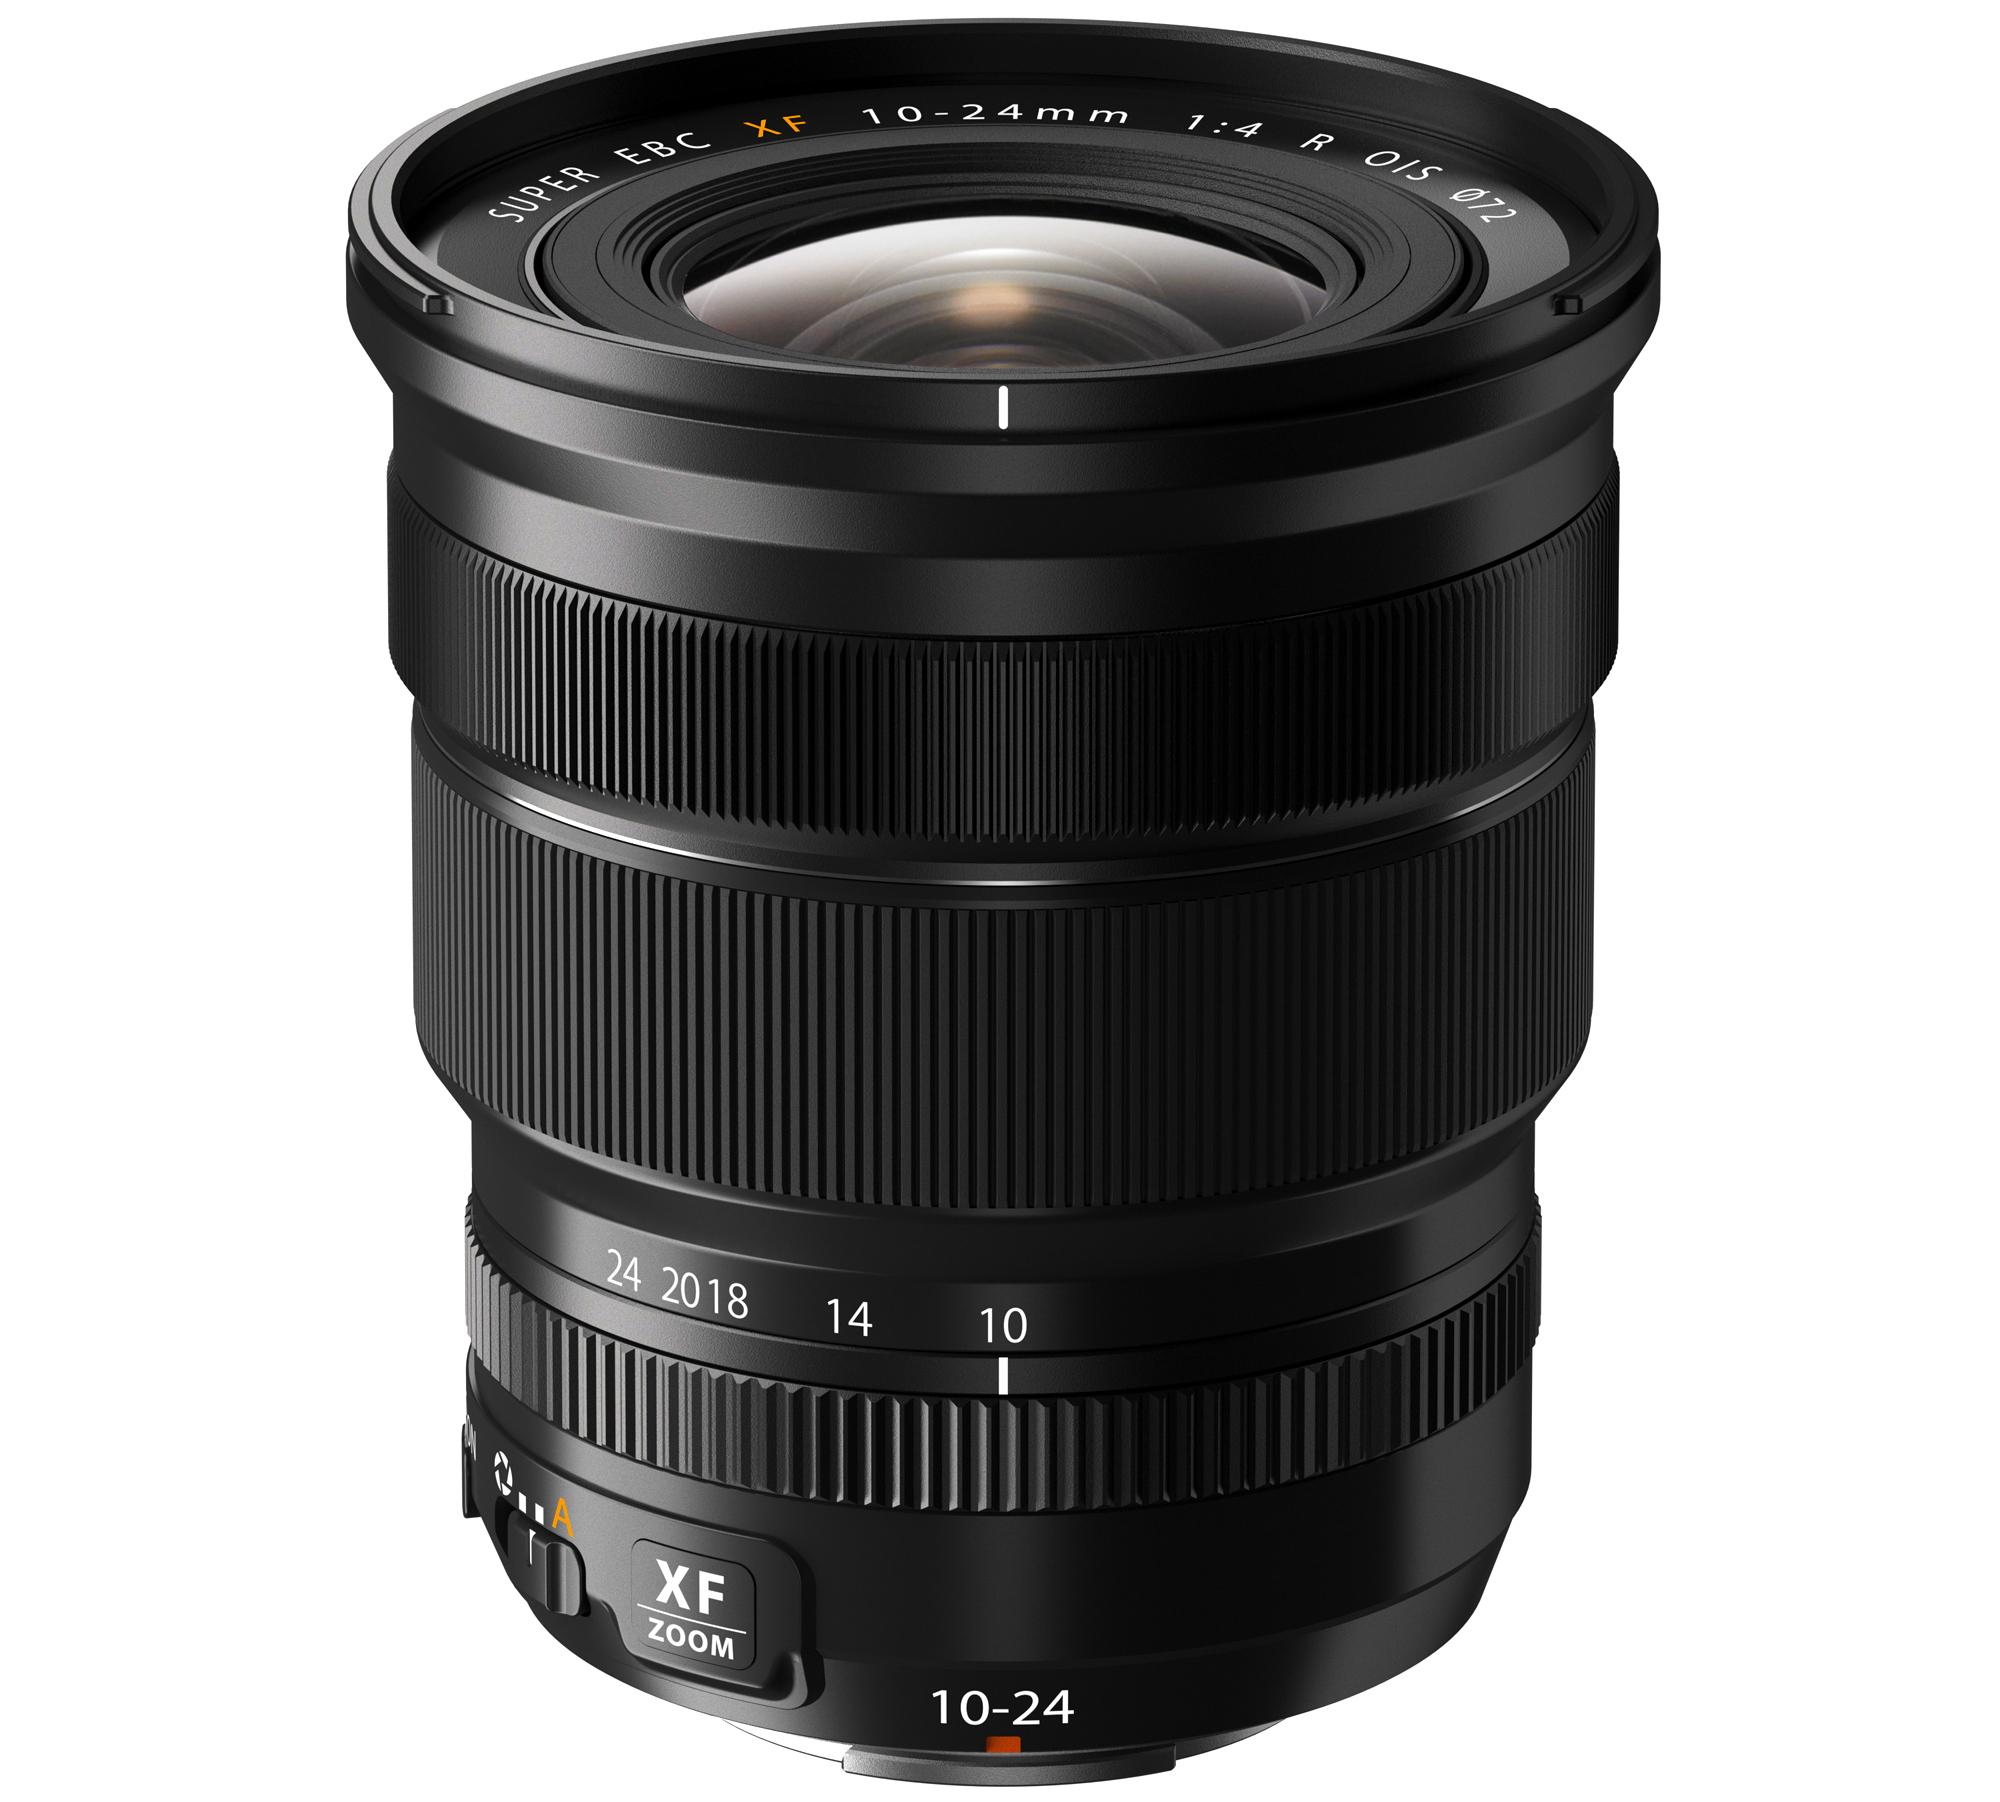 Fujinon XF 10-24mm f/4 R IOS